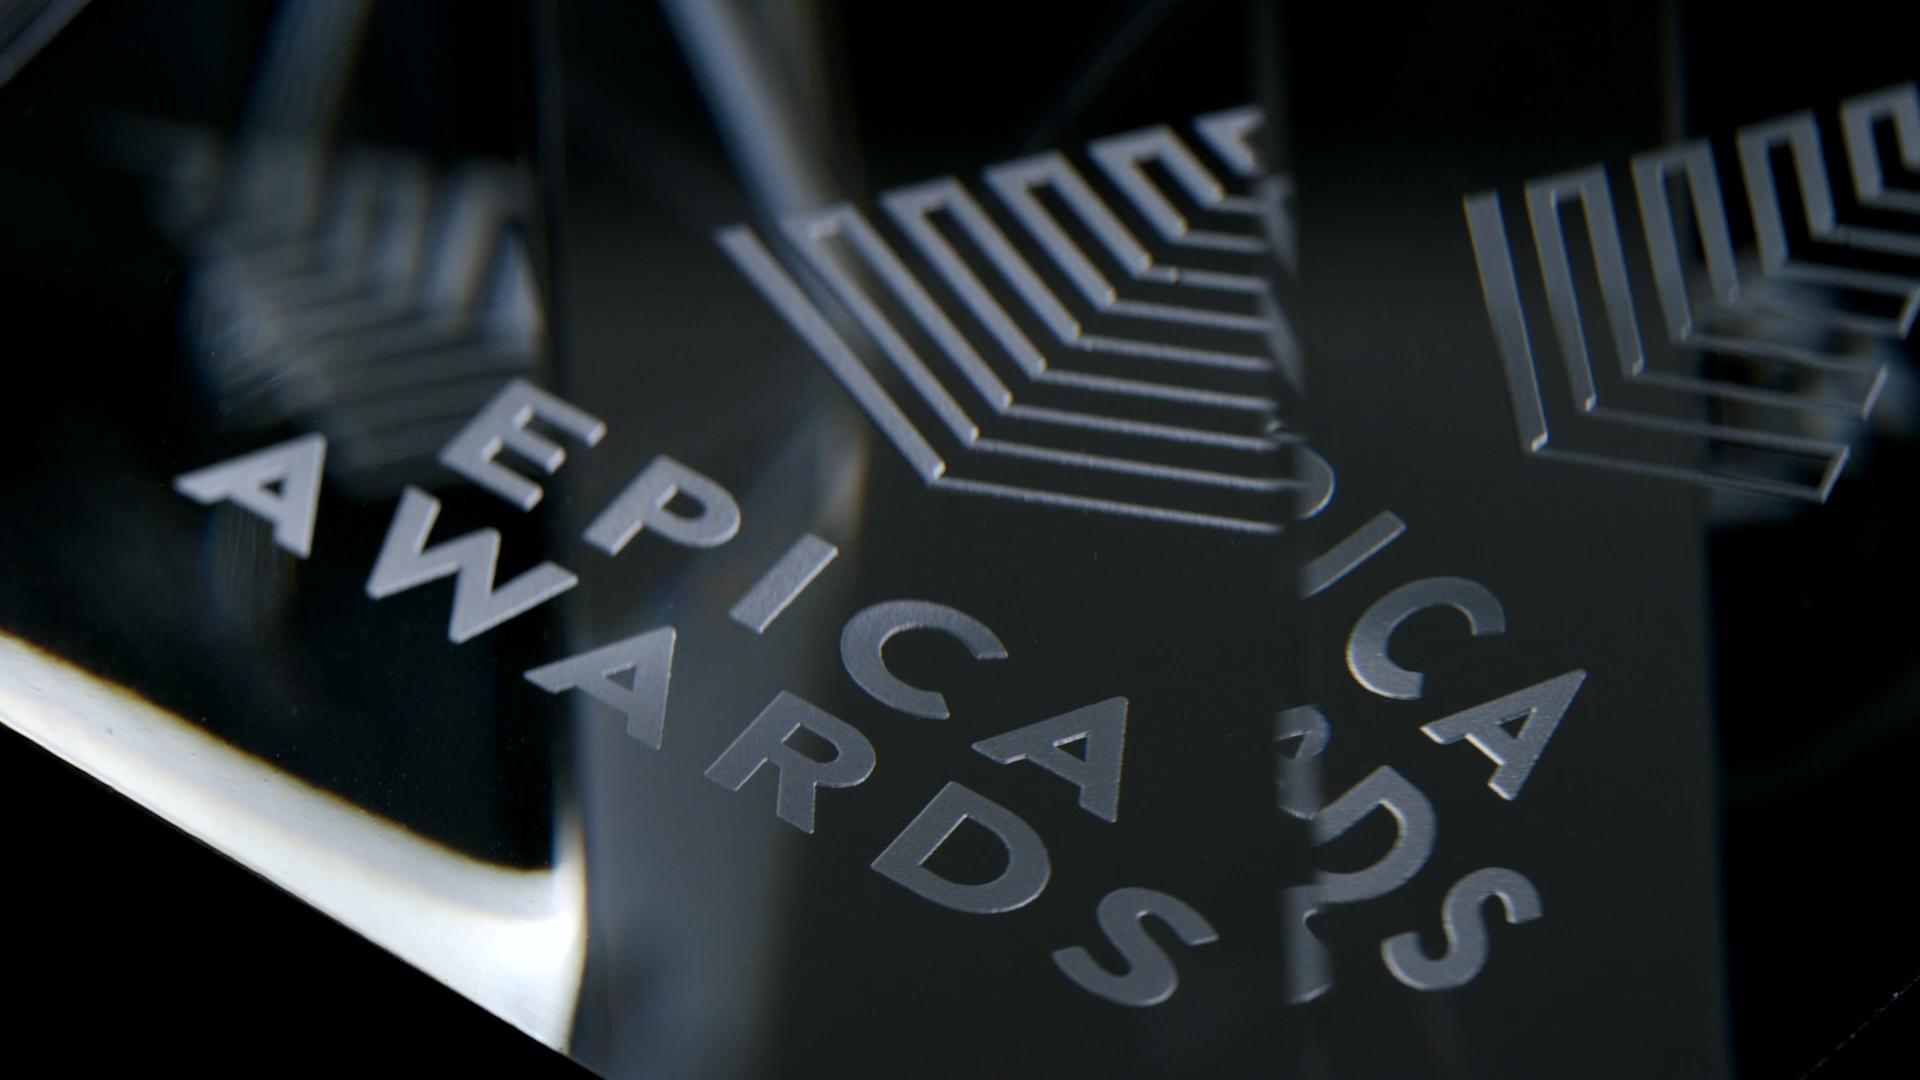 Epica Awards announces final deadline extension to Monday, November 16